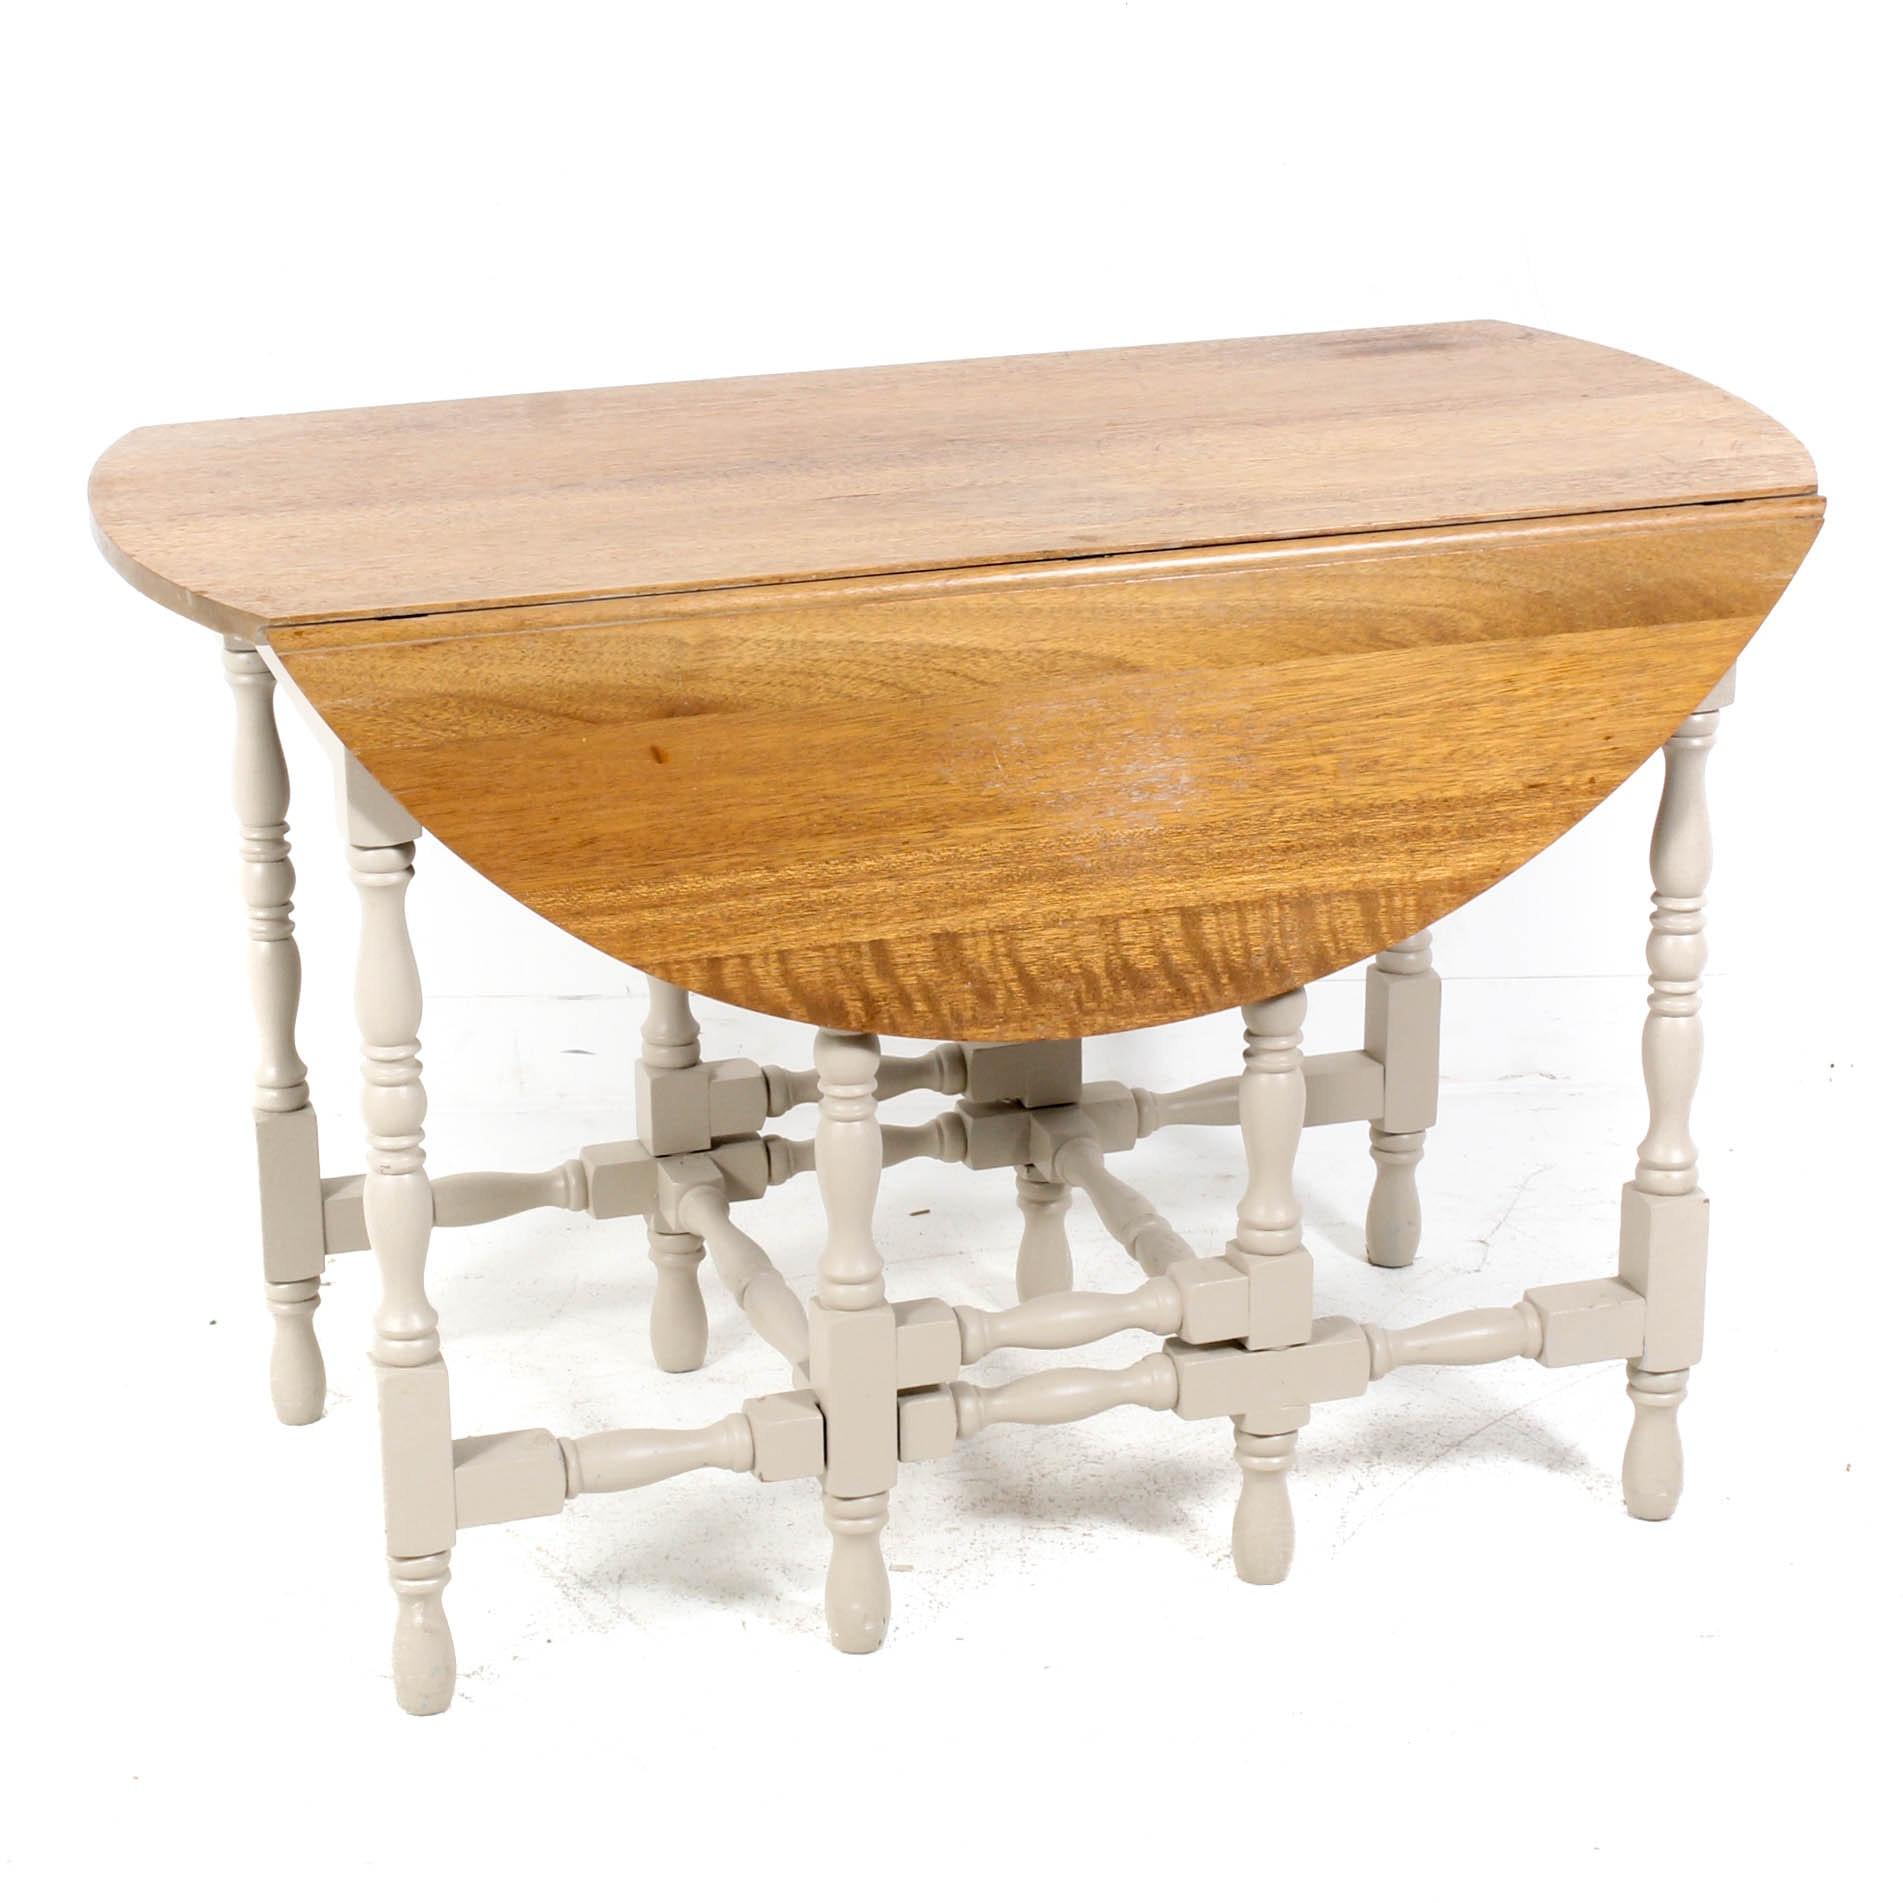 Vintage Wood Gate-Leg Drop-Leaf Table with Drawer